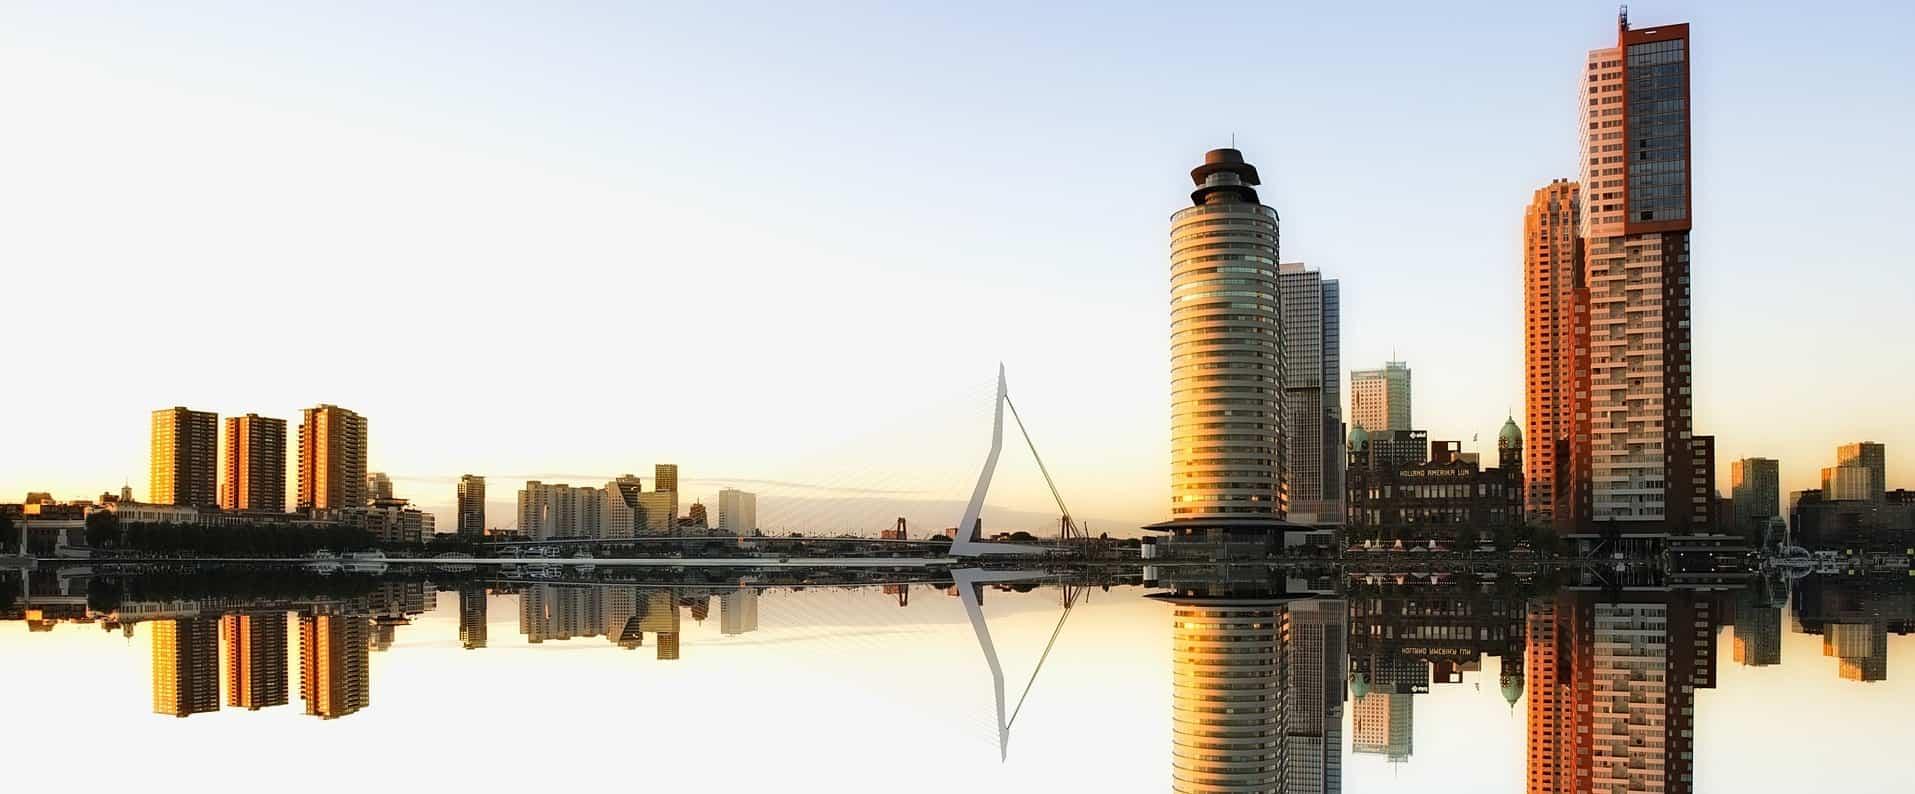 tapijtreiniging Rotterdam en omgeving | Tapijtenreiniging.nl | Tapijt Reinigen Rotterdam